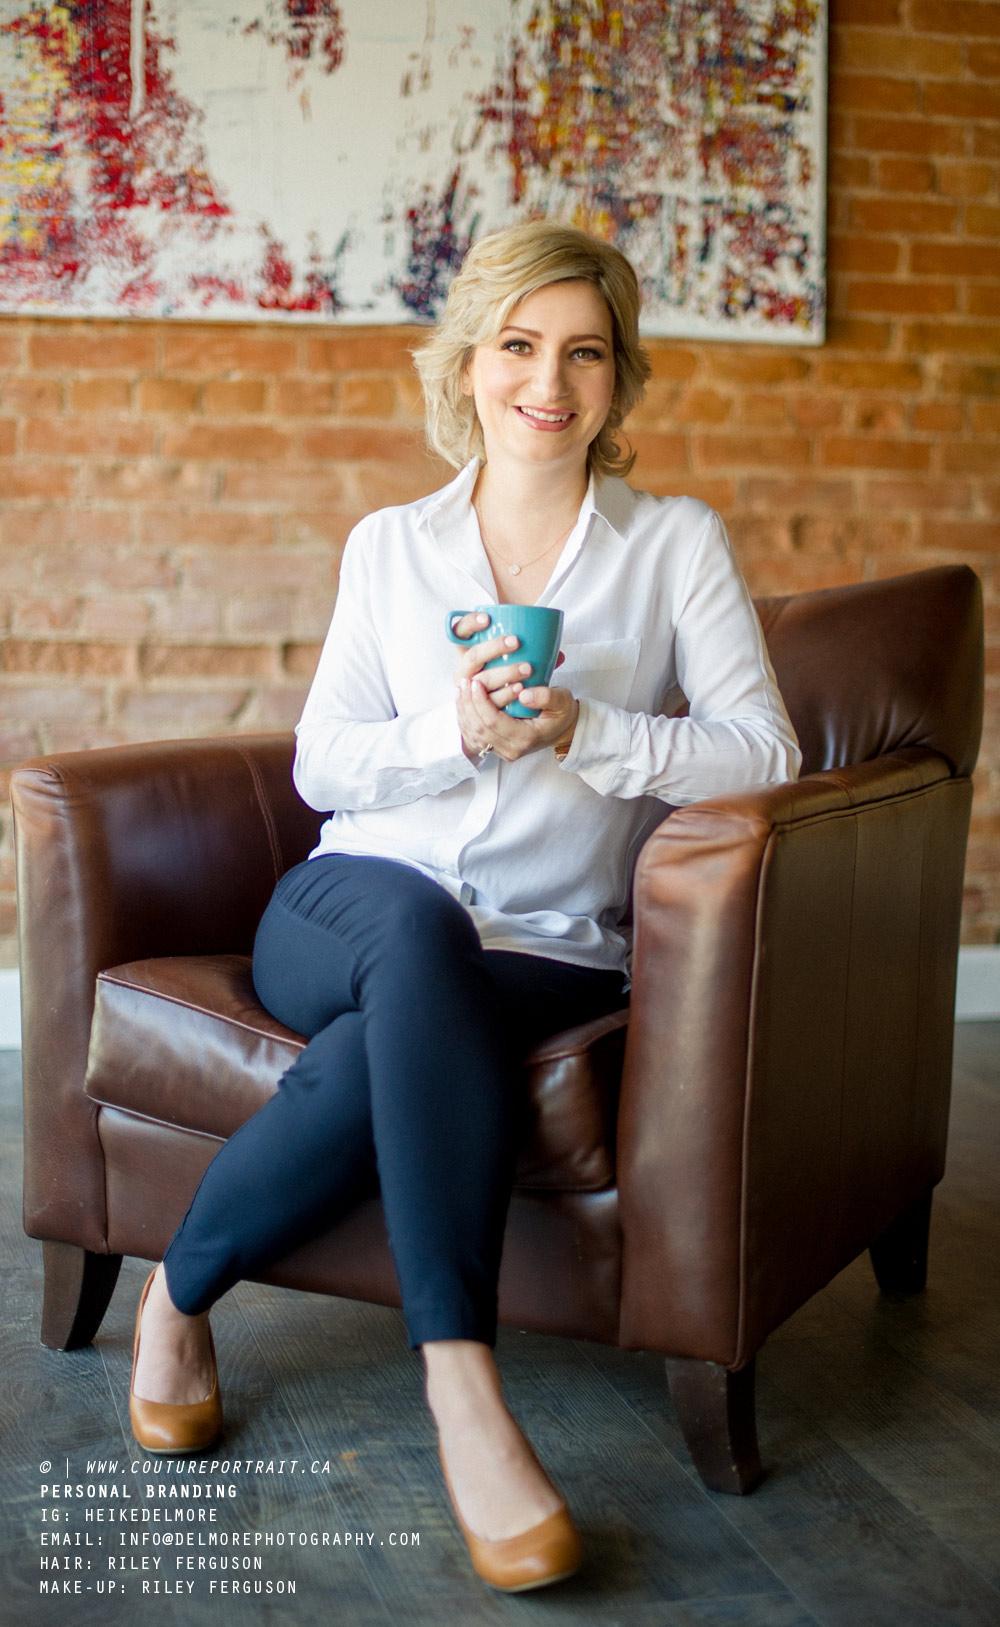 Personal Branding photography Heike Delmore - Nest Realty Meg Lyttle